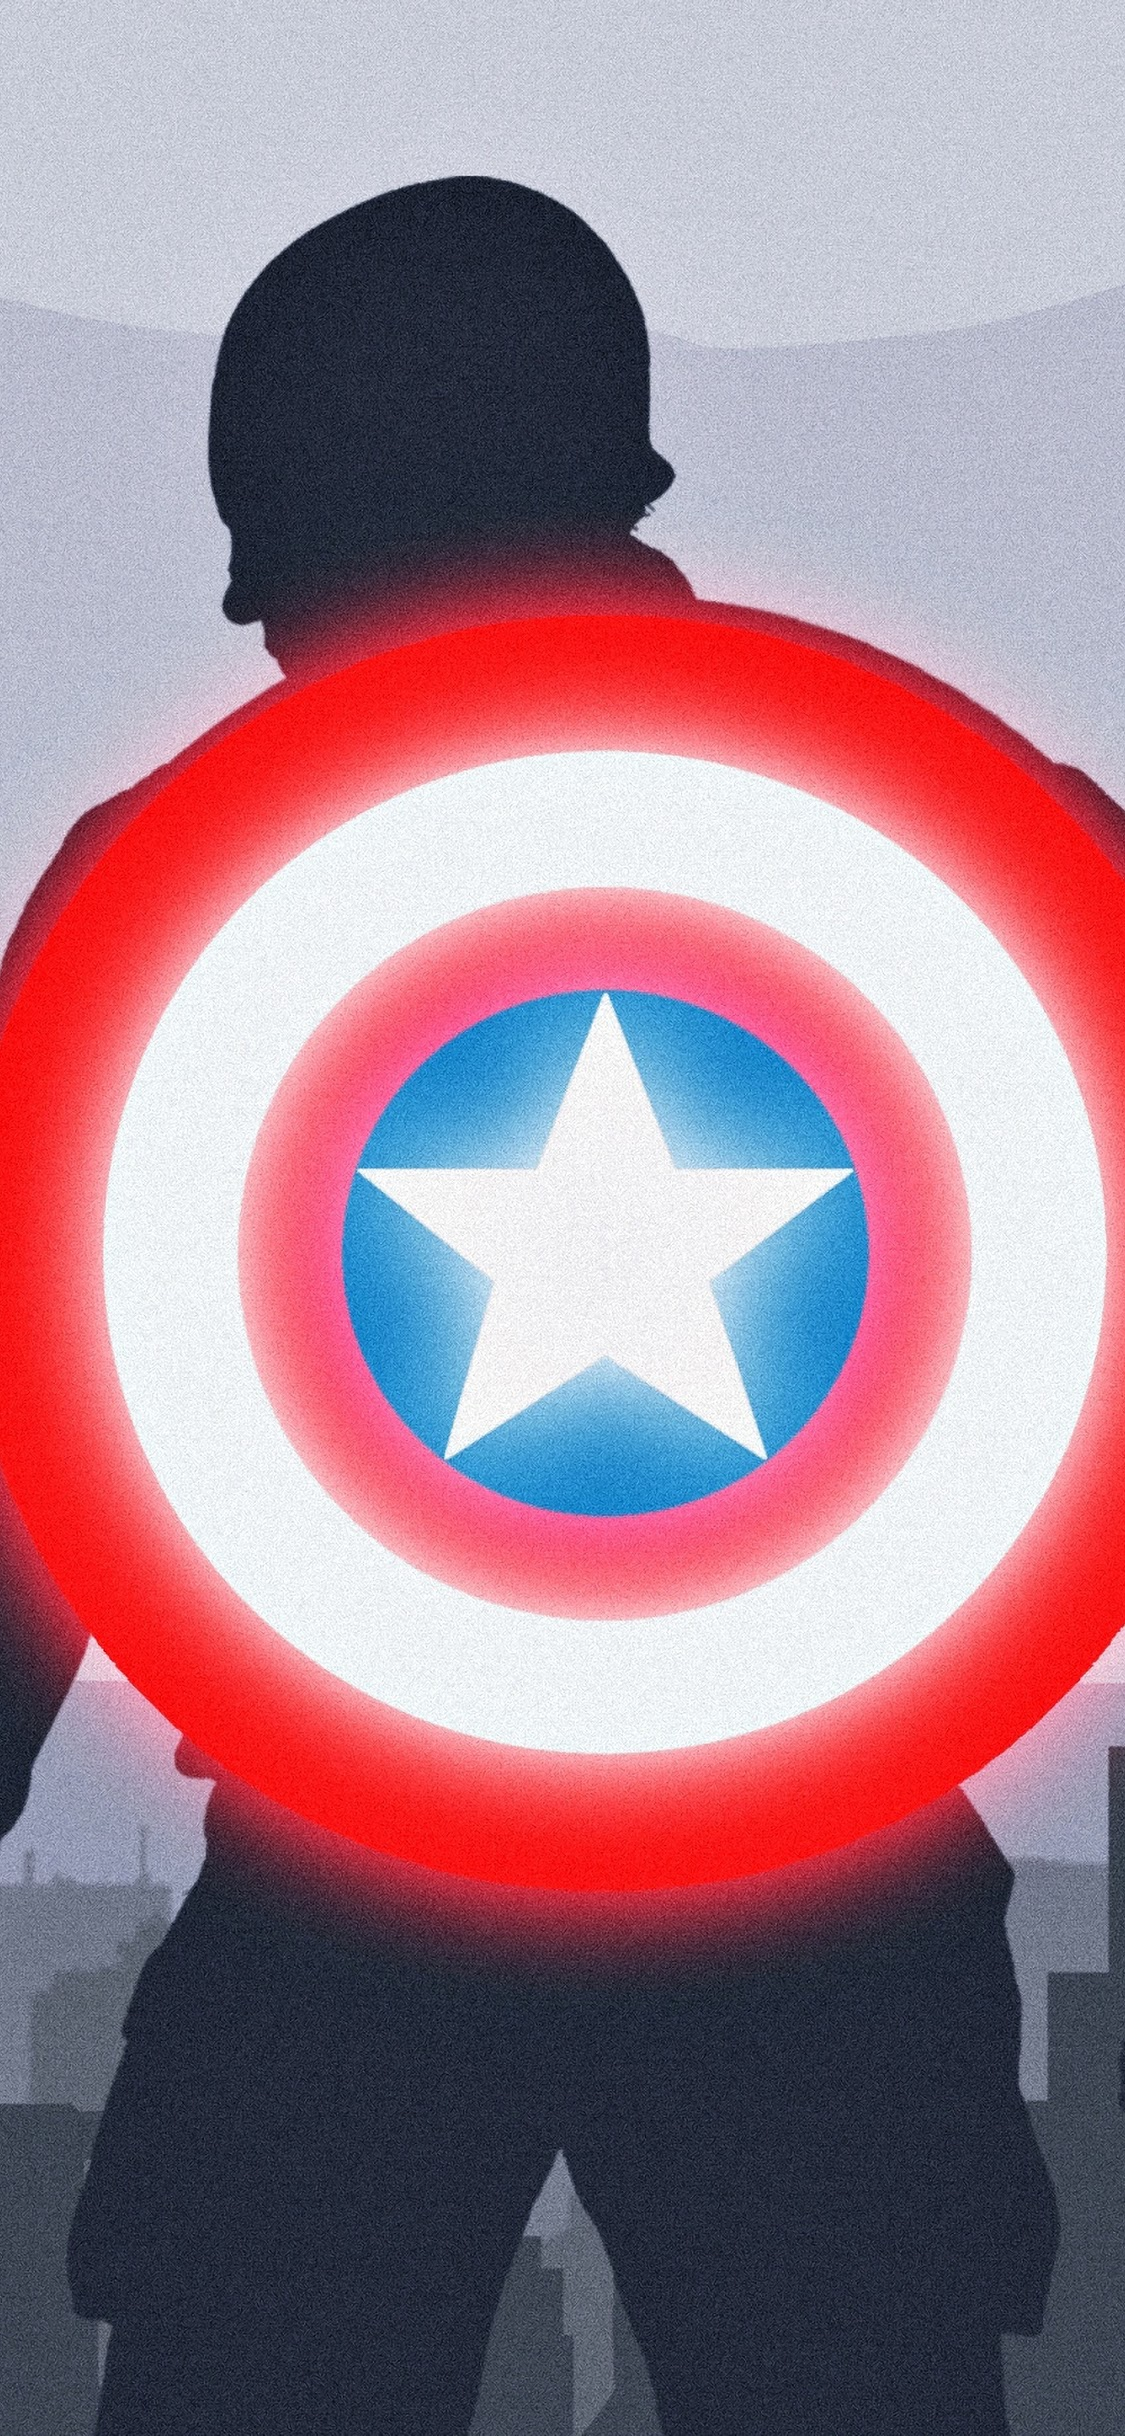 Captain America Shield Minimalist 4k 24 Wallpaper